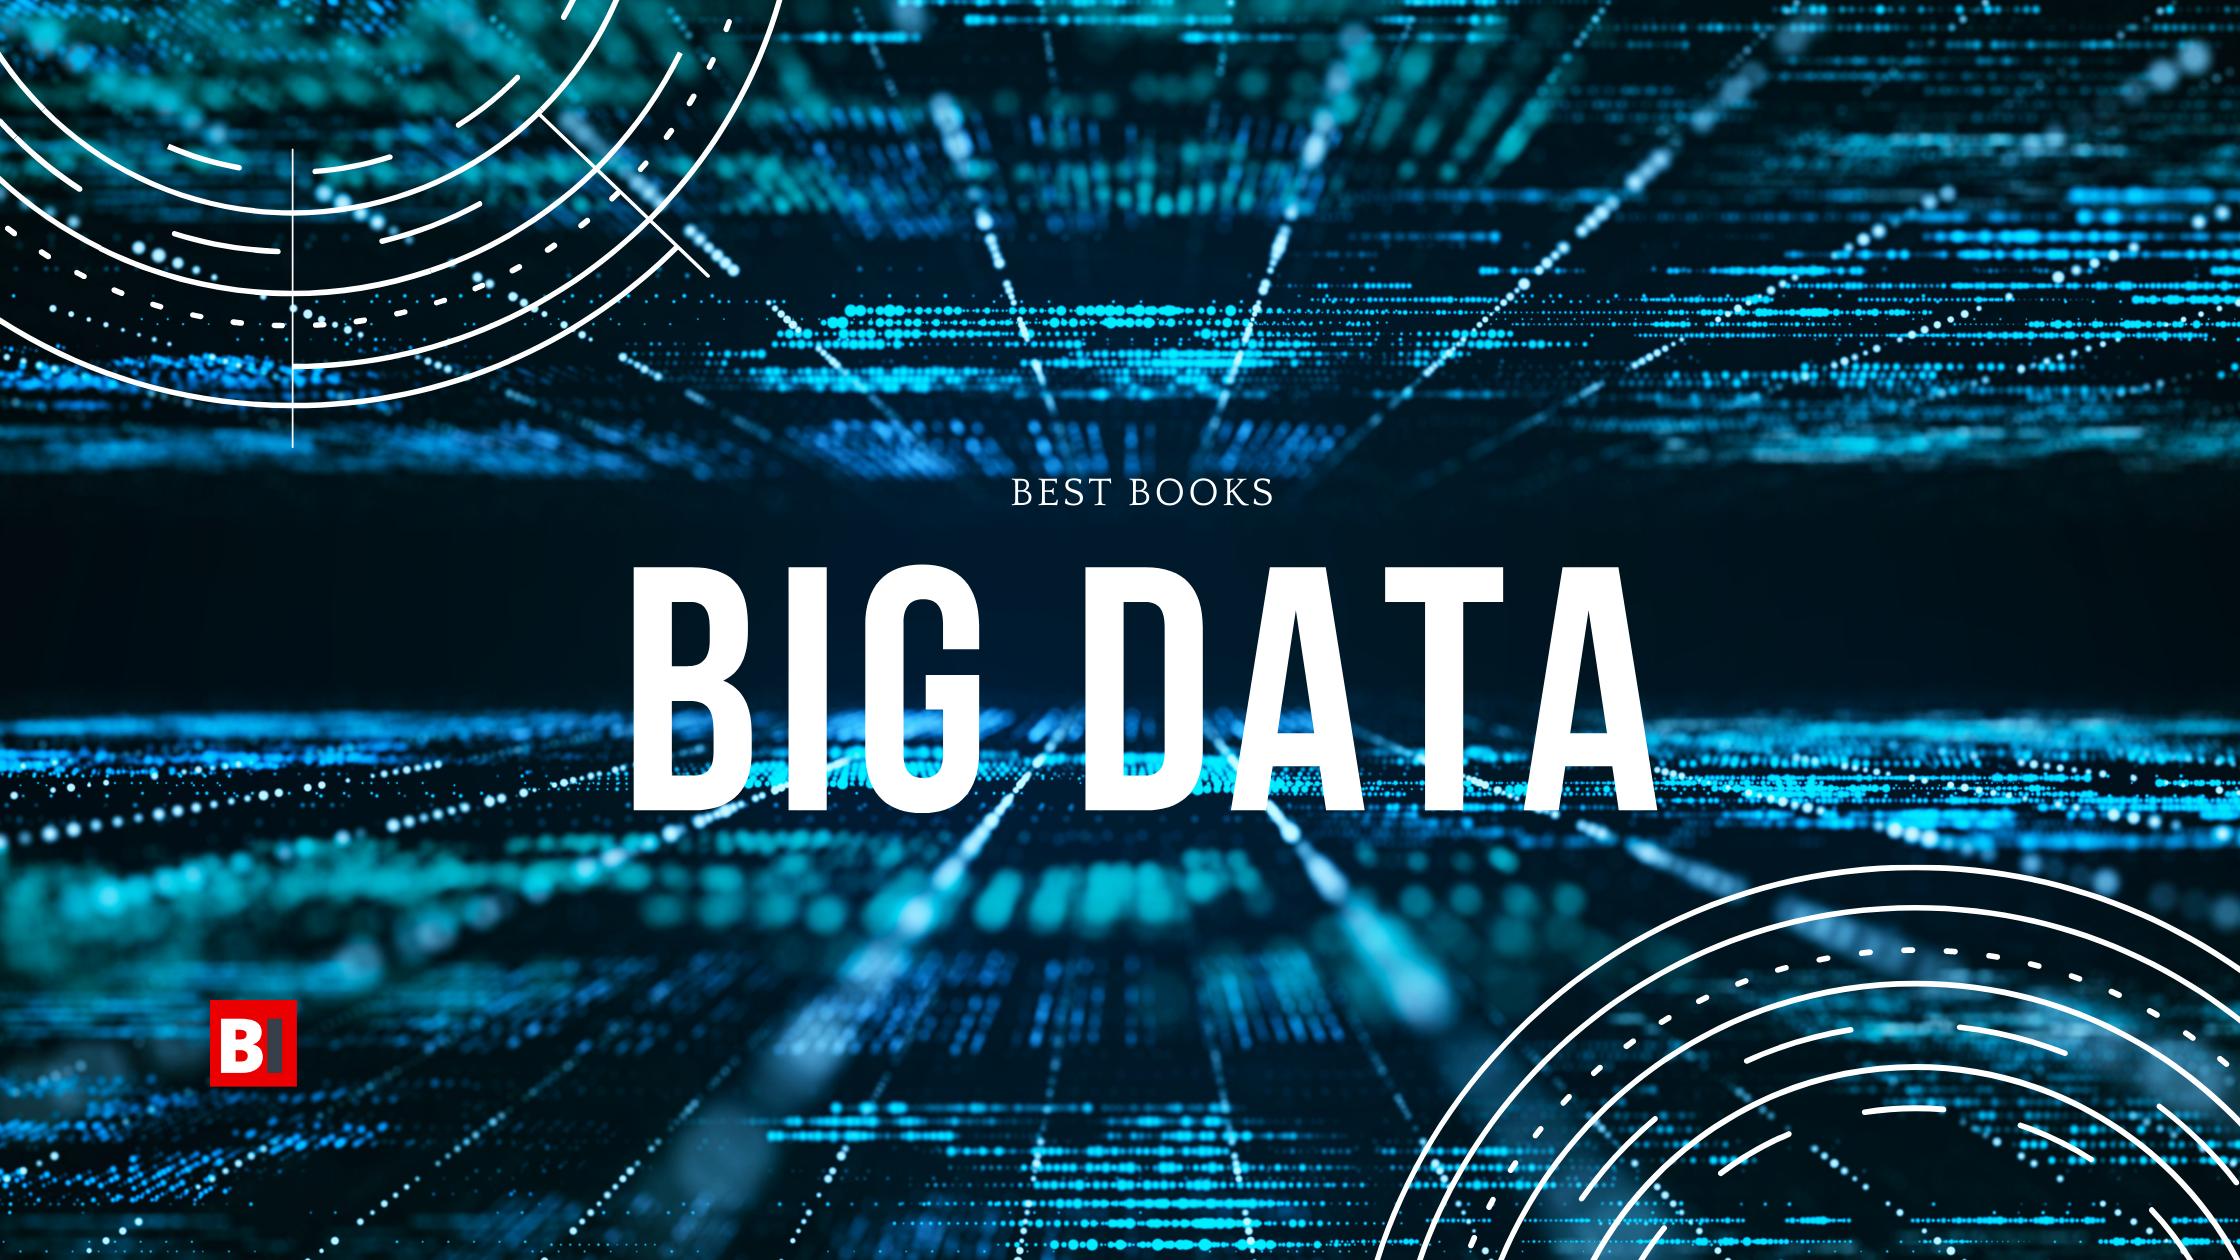 Best Books on Big Data